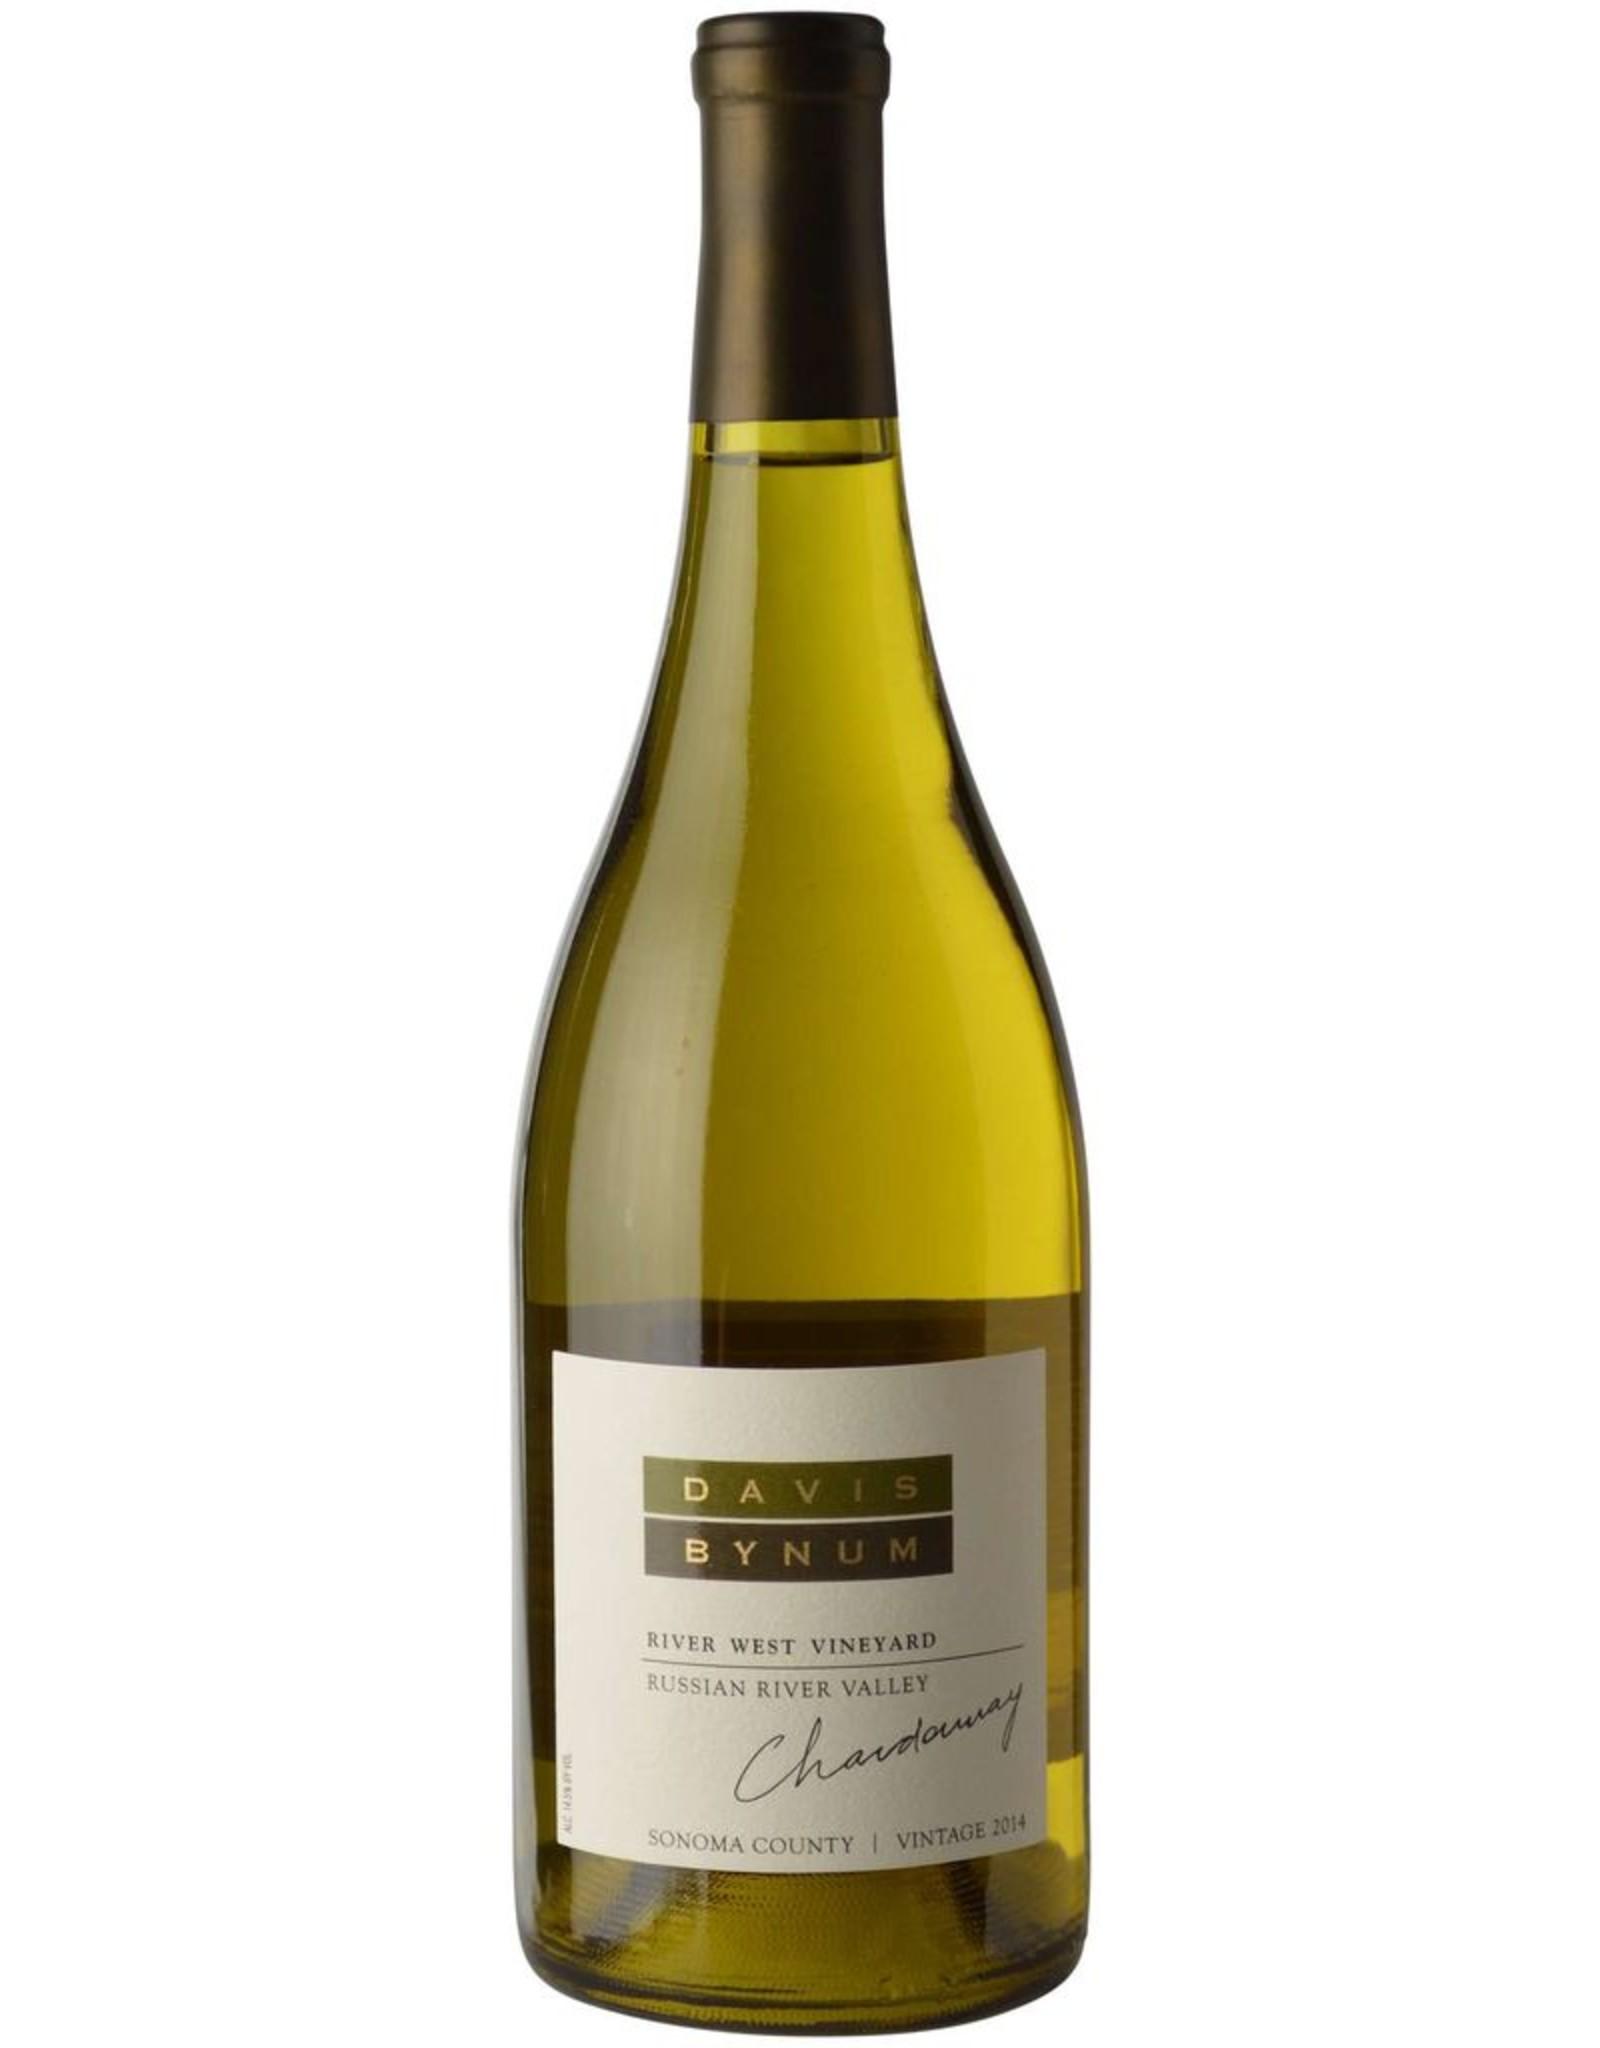 White Wine 2014, Davis Bynum River West Vineyard, Chardonnay, Russian River, Sonoma, California, USA, 14.5% Alc